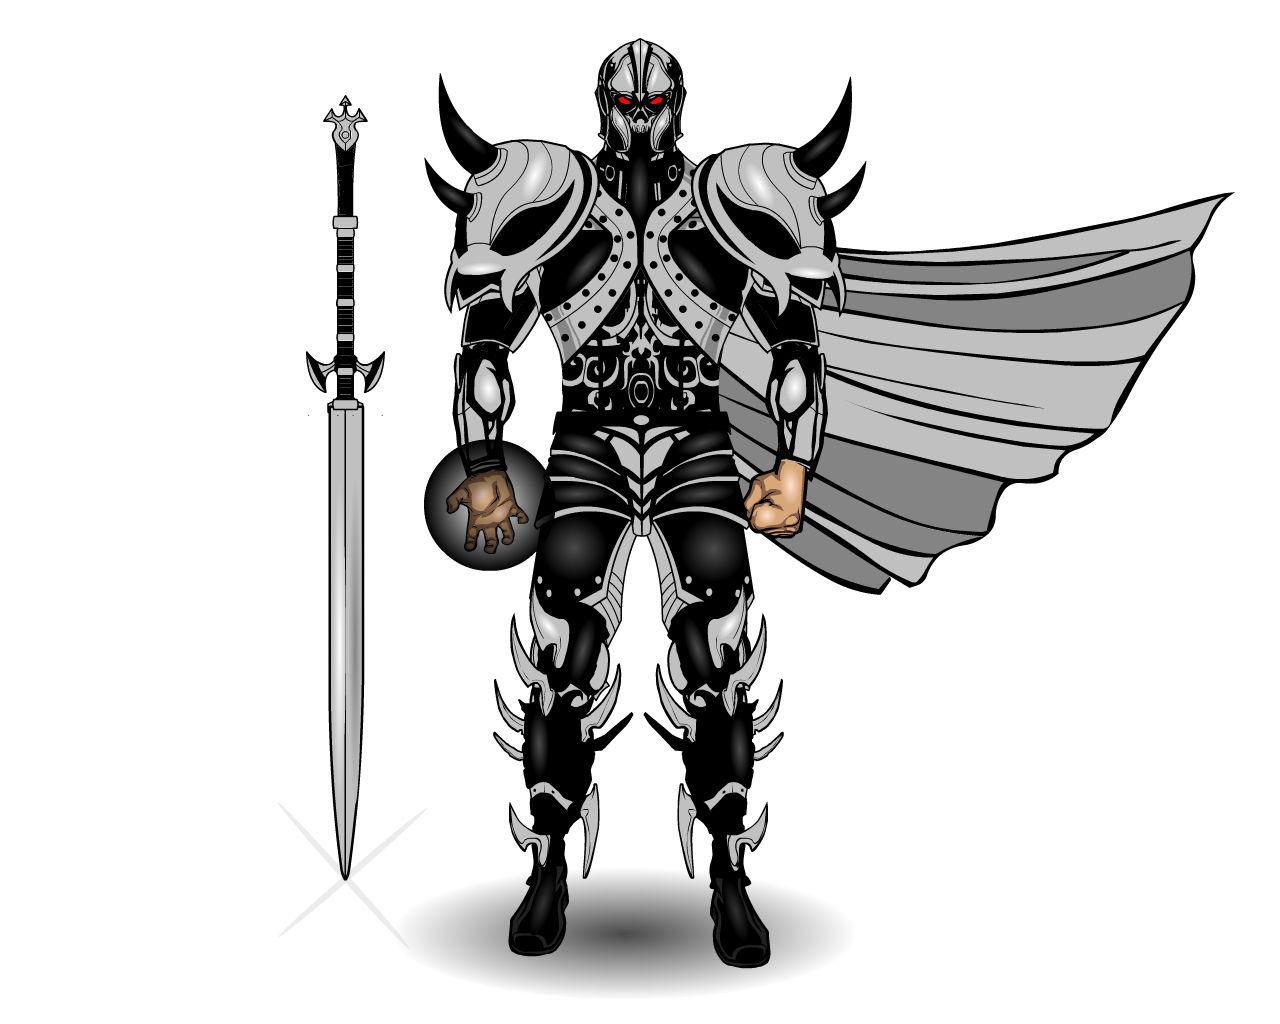 http://www.heromachine.com/wp-content/legacy/forum-image-uploads/hawk007/2013/10/Dark-King.jpg